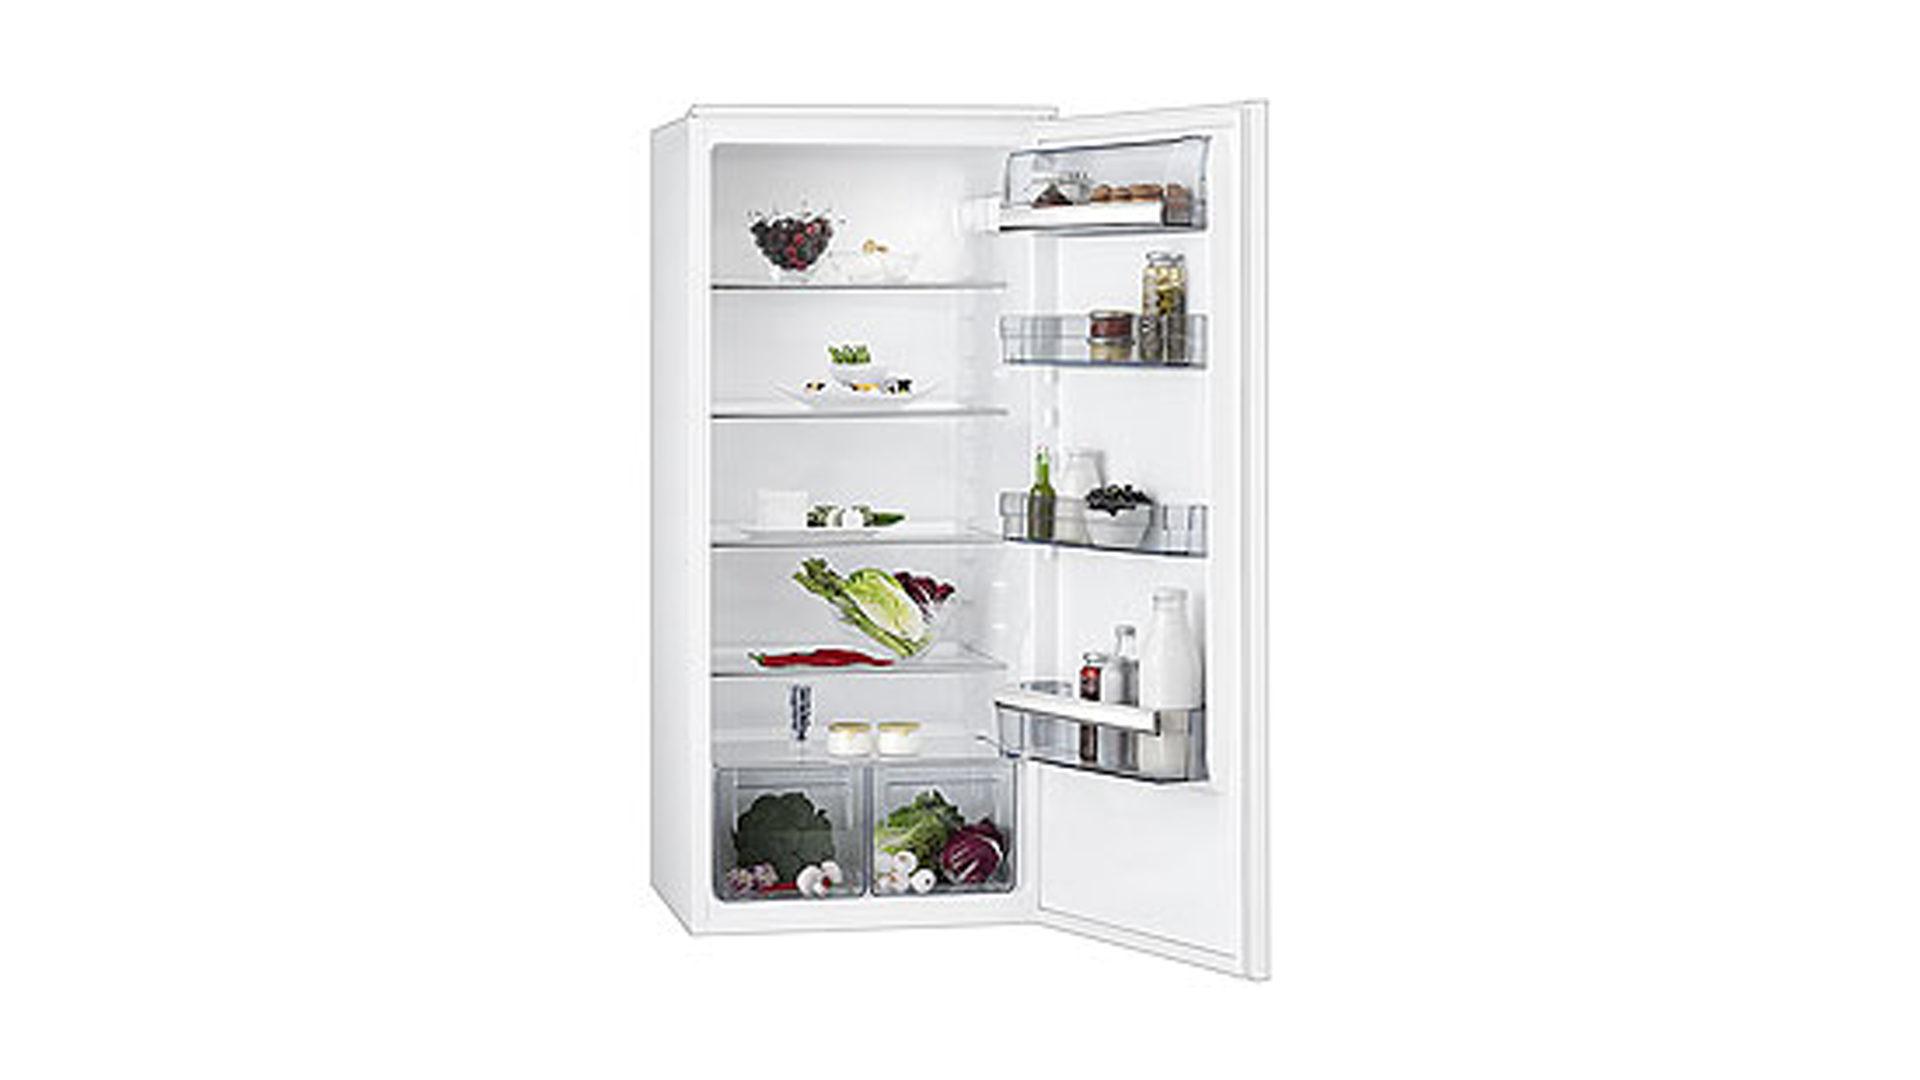 Aeg Kühlschrank 158 Cm : Wohnland breitwieser markenshops kühlschränke aeg aeg